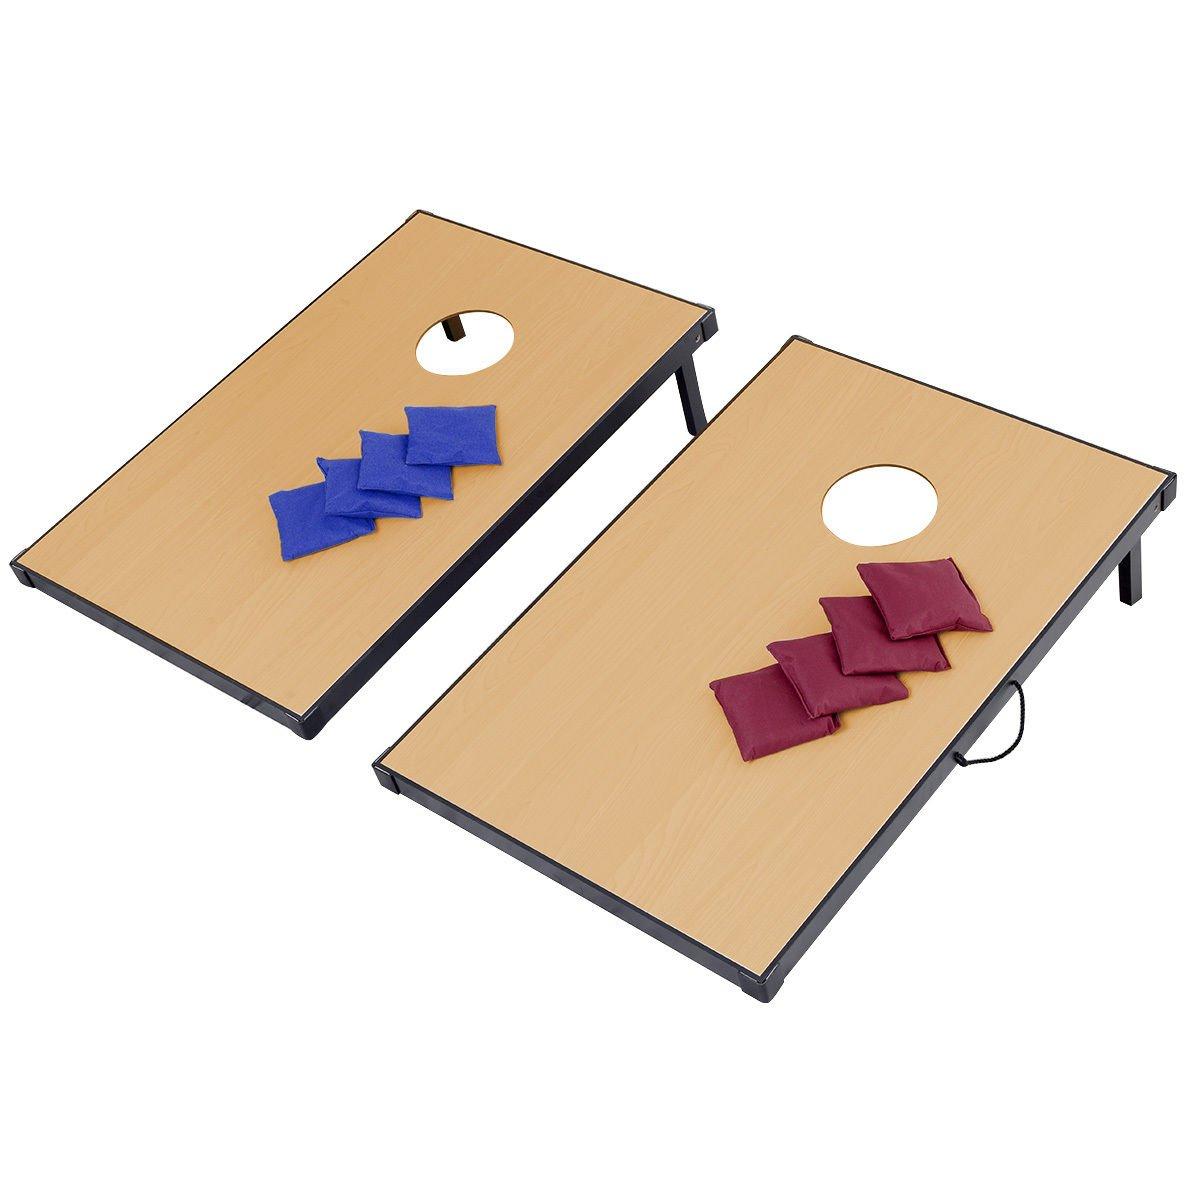 TANGKULA Cornhole Game Set Wood with 8 Bean Bags Portable Blue and Red Bean Bag set (47'' x 23.5'' x 3'')